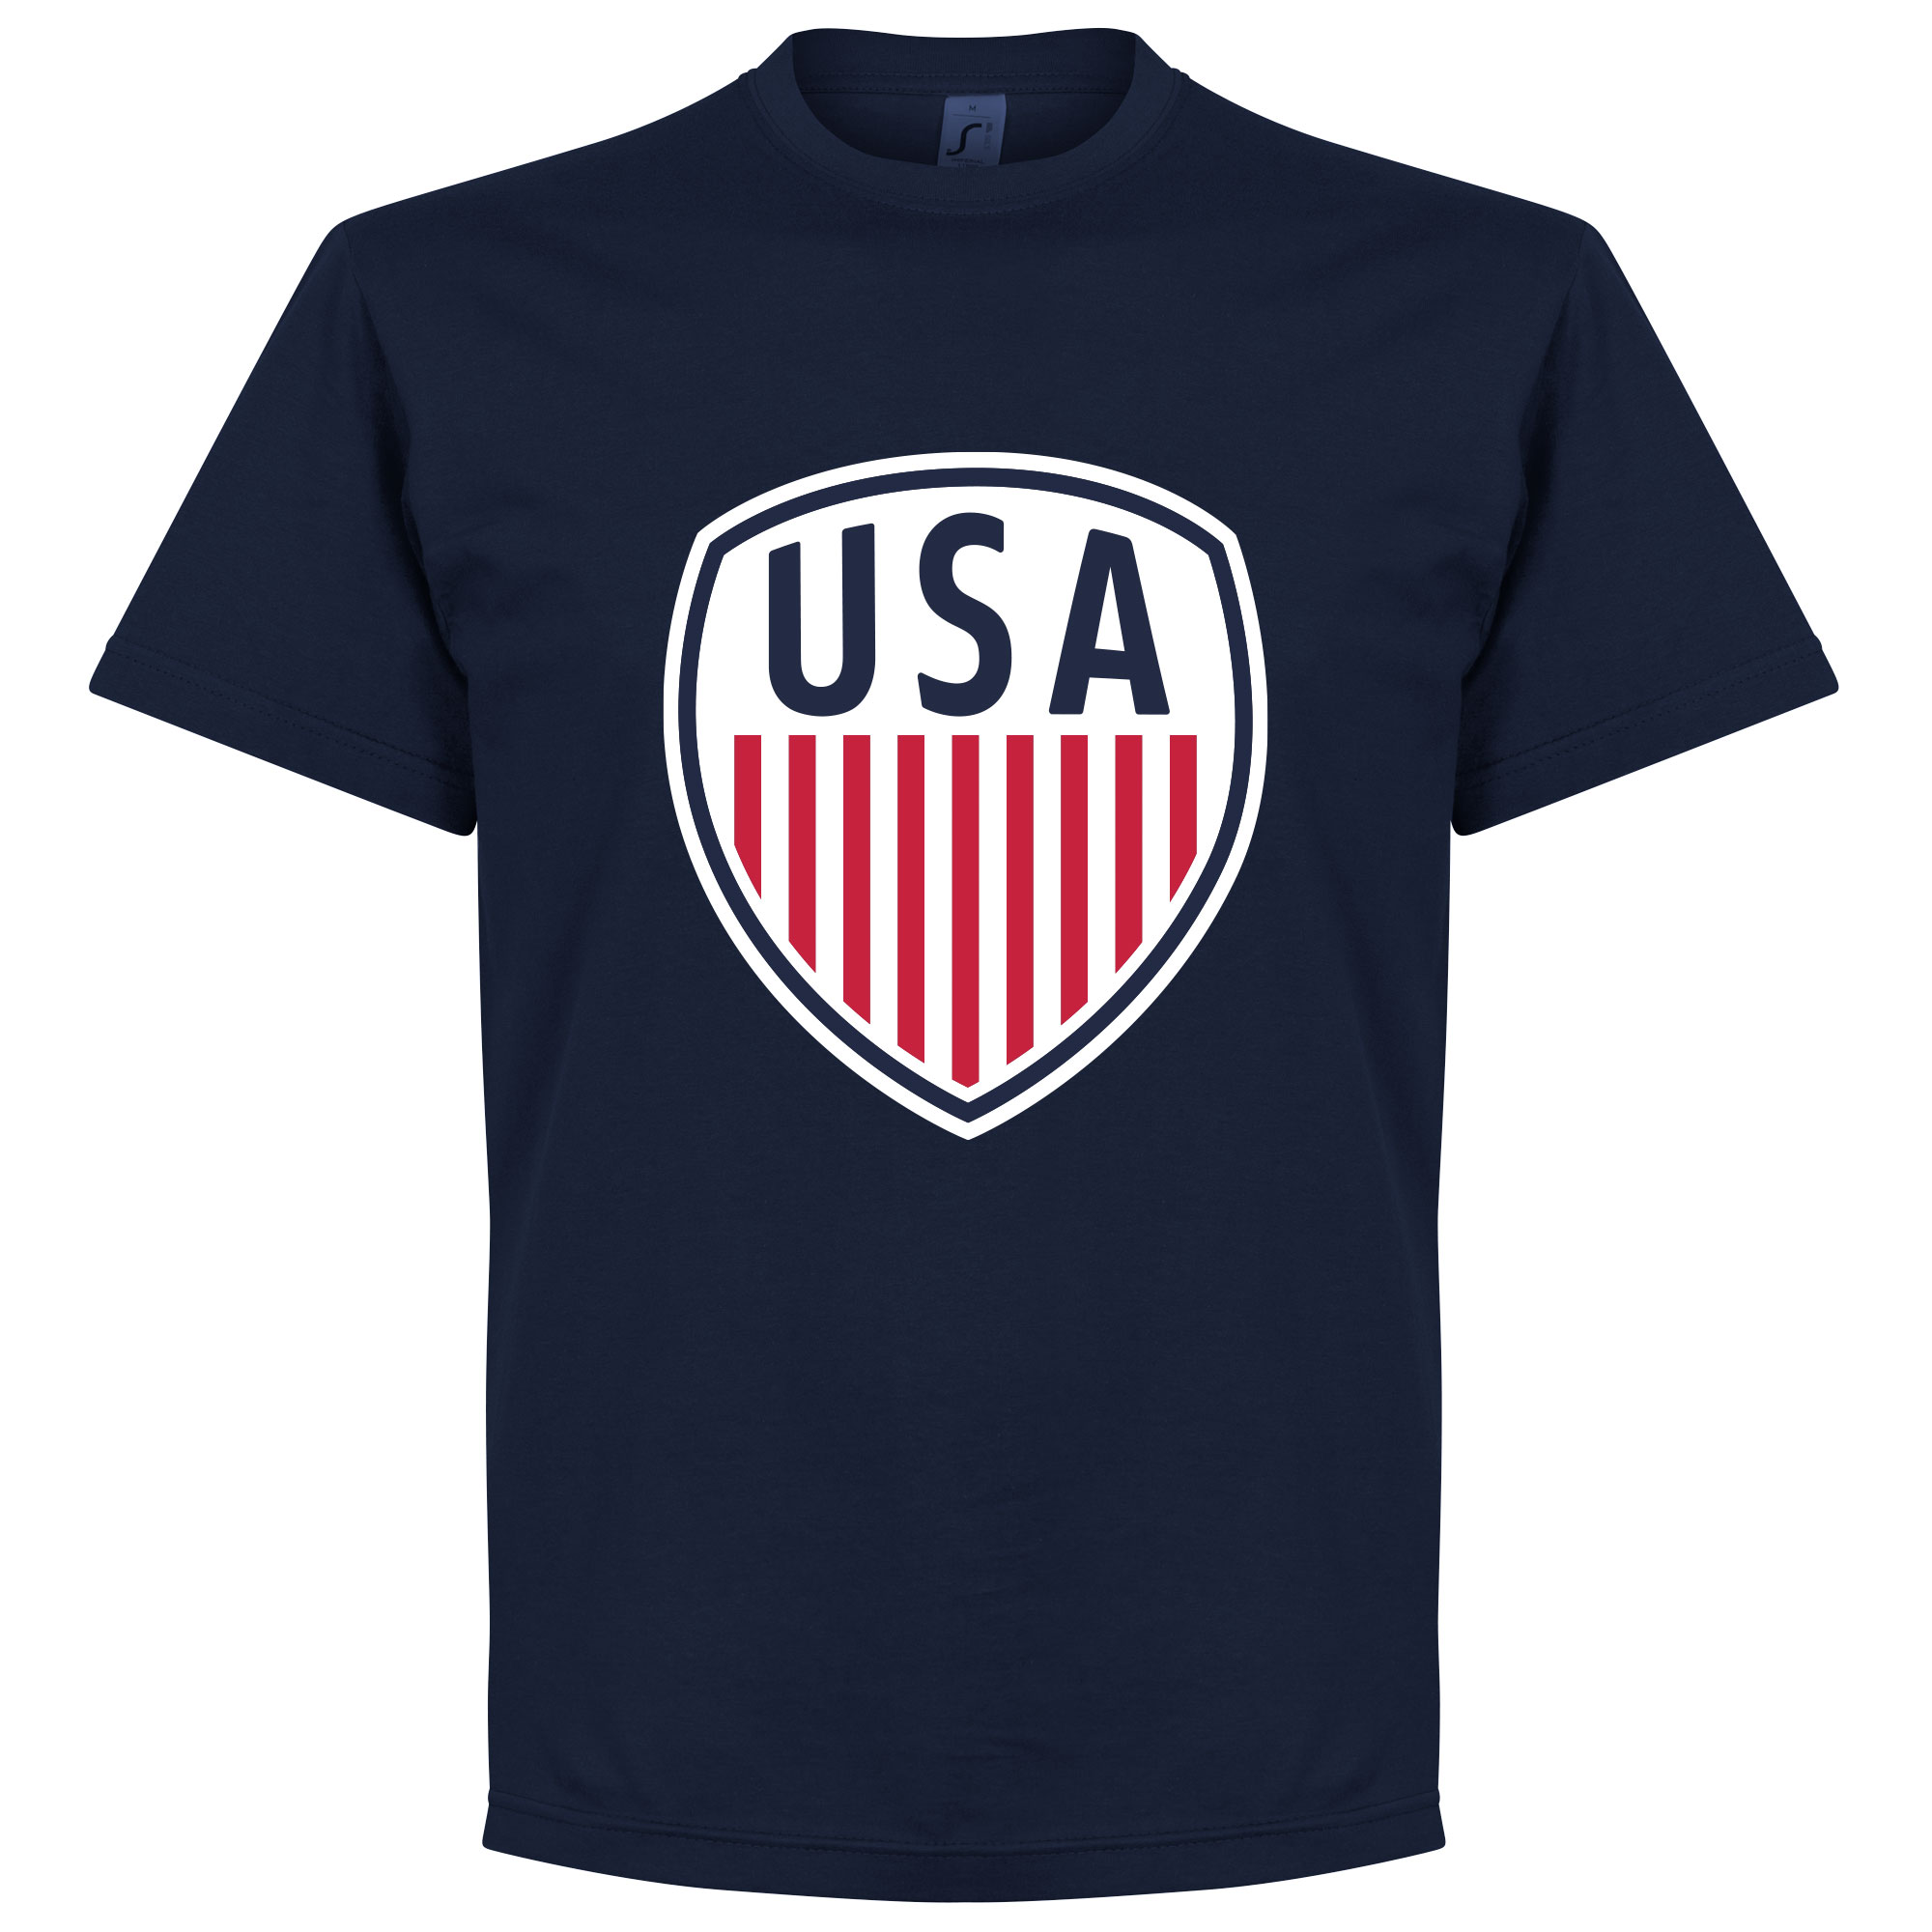 USA Crest Tee - Navy - XXL